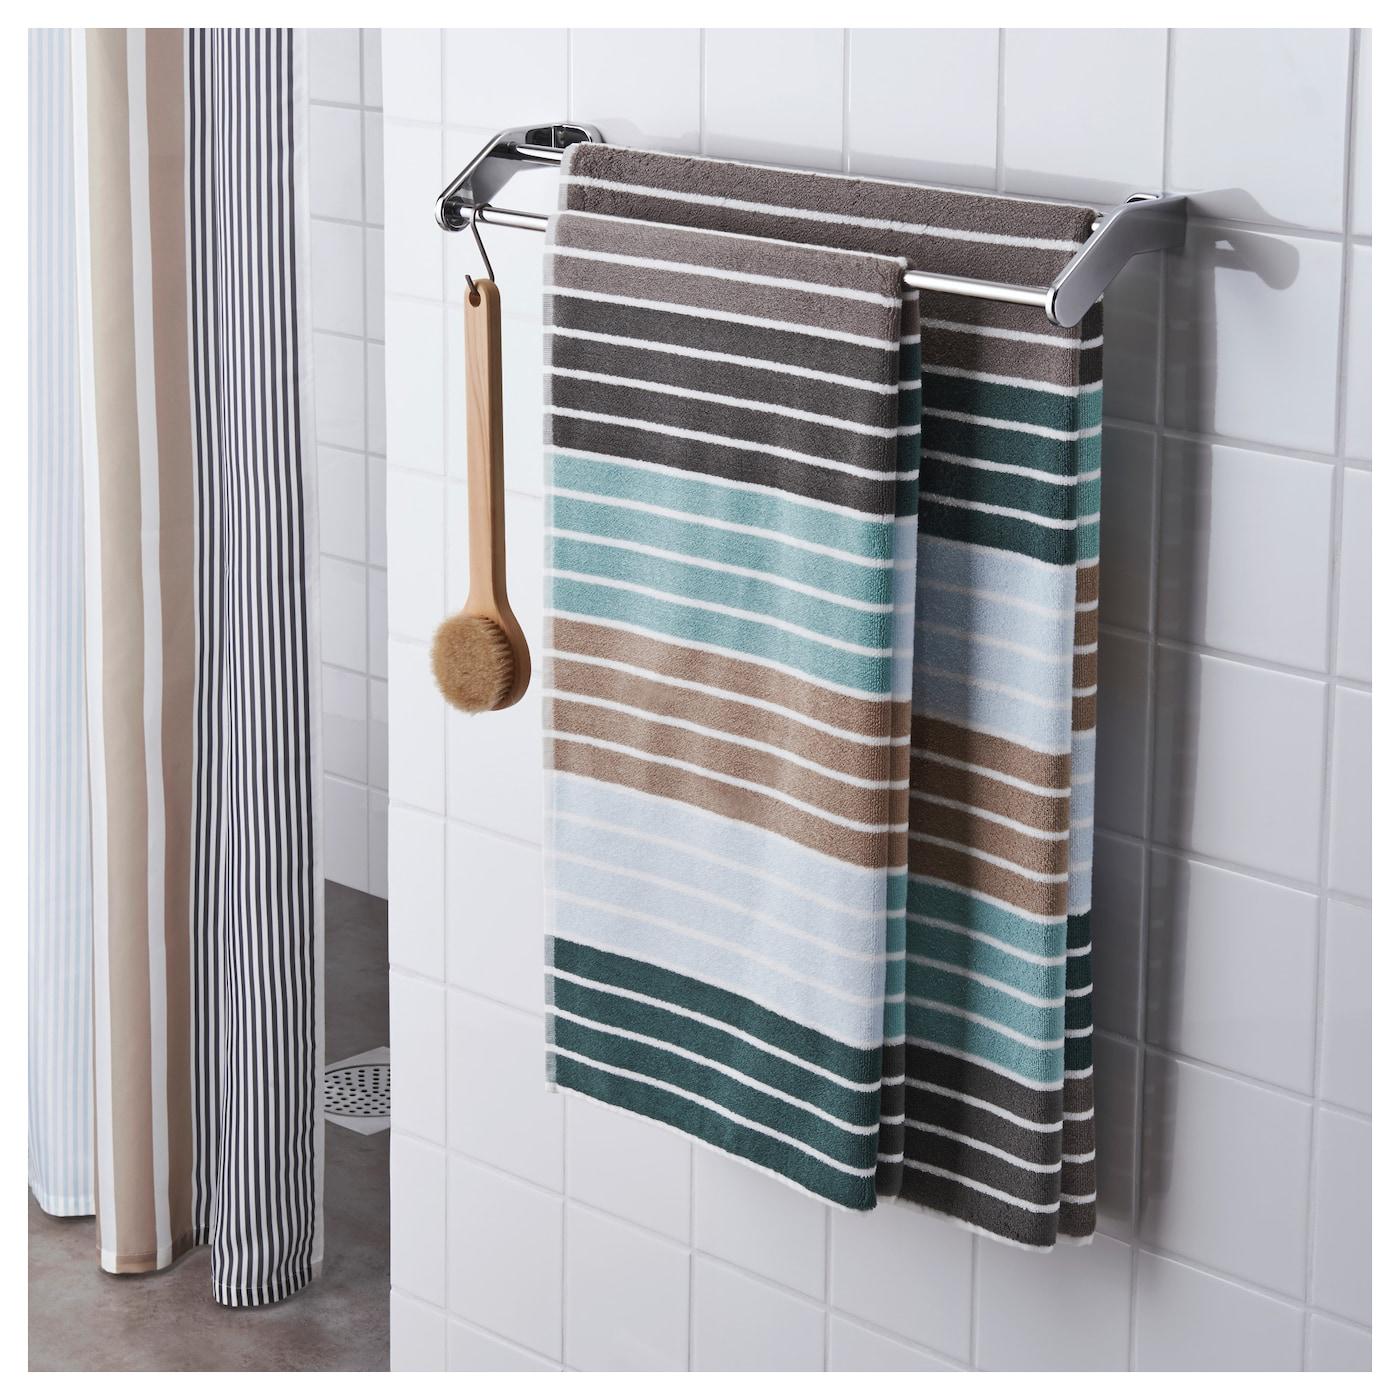 bolm n bath towel multicolour 70x140 cm ikea. Black Bedroom Furniture Sets. Home Design Ideas